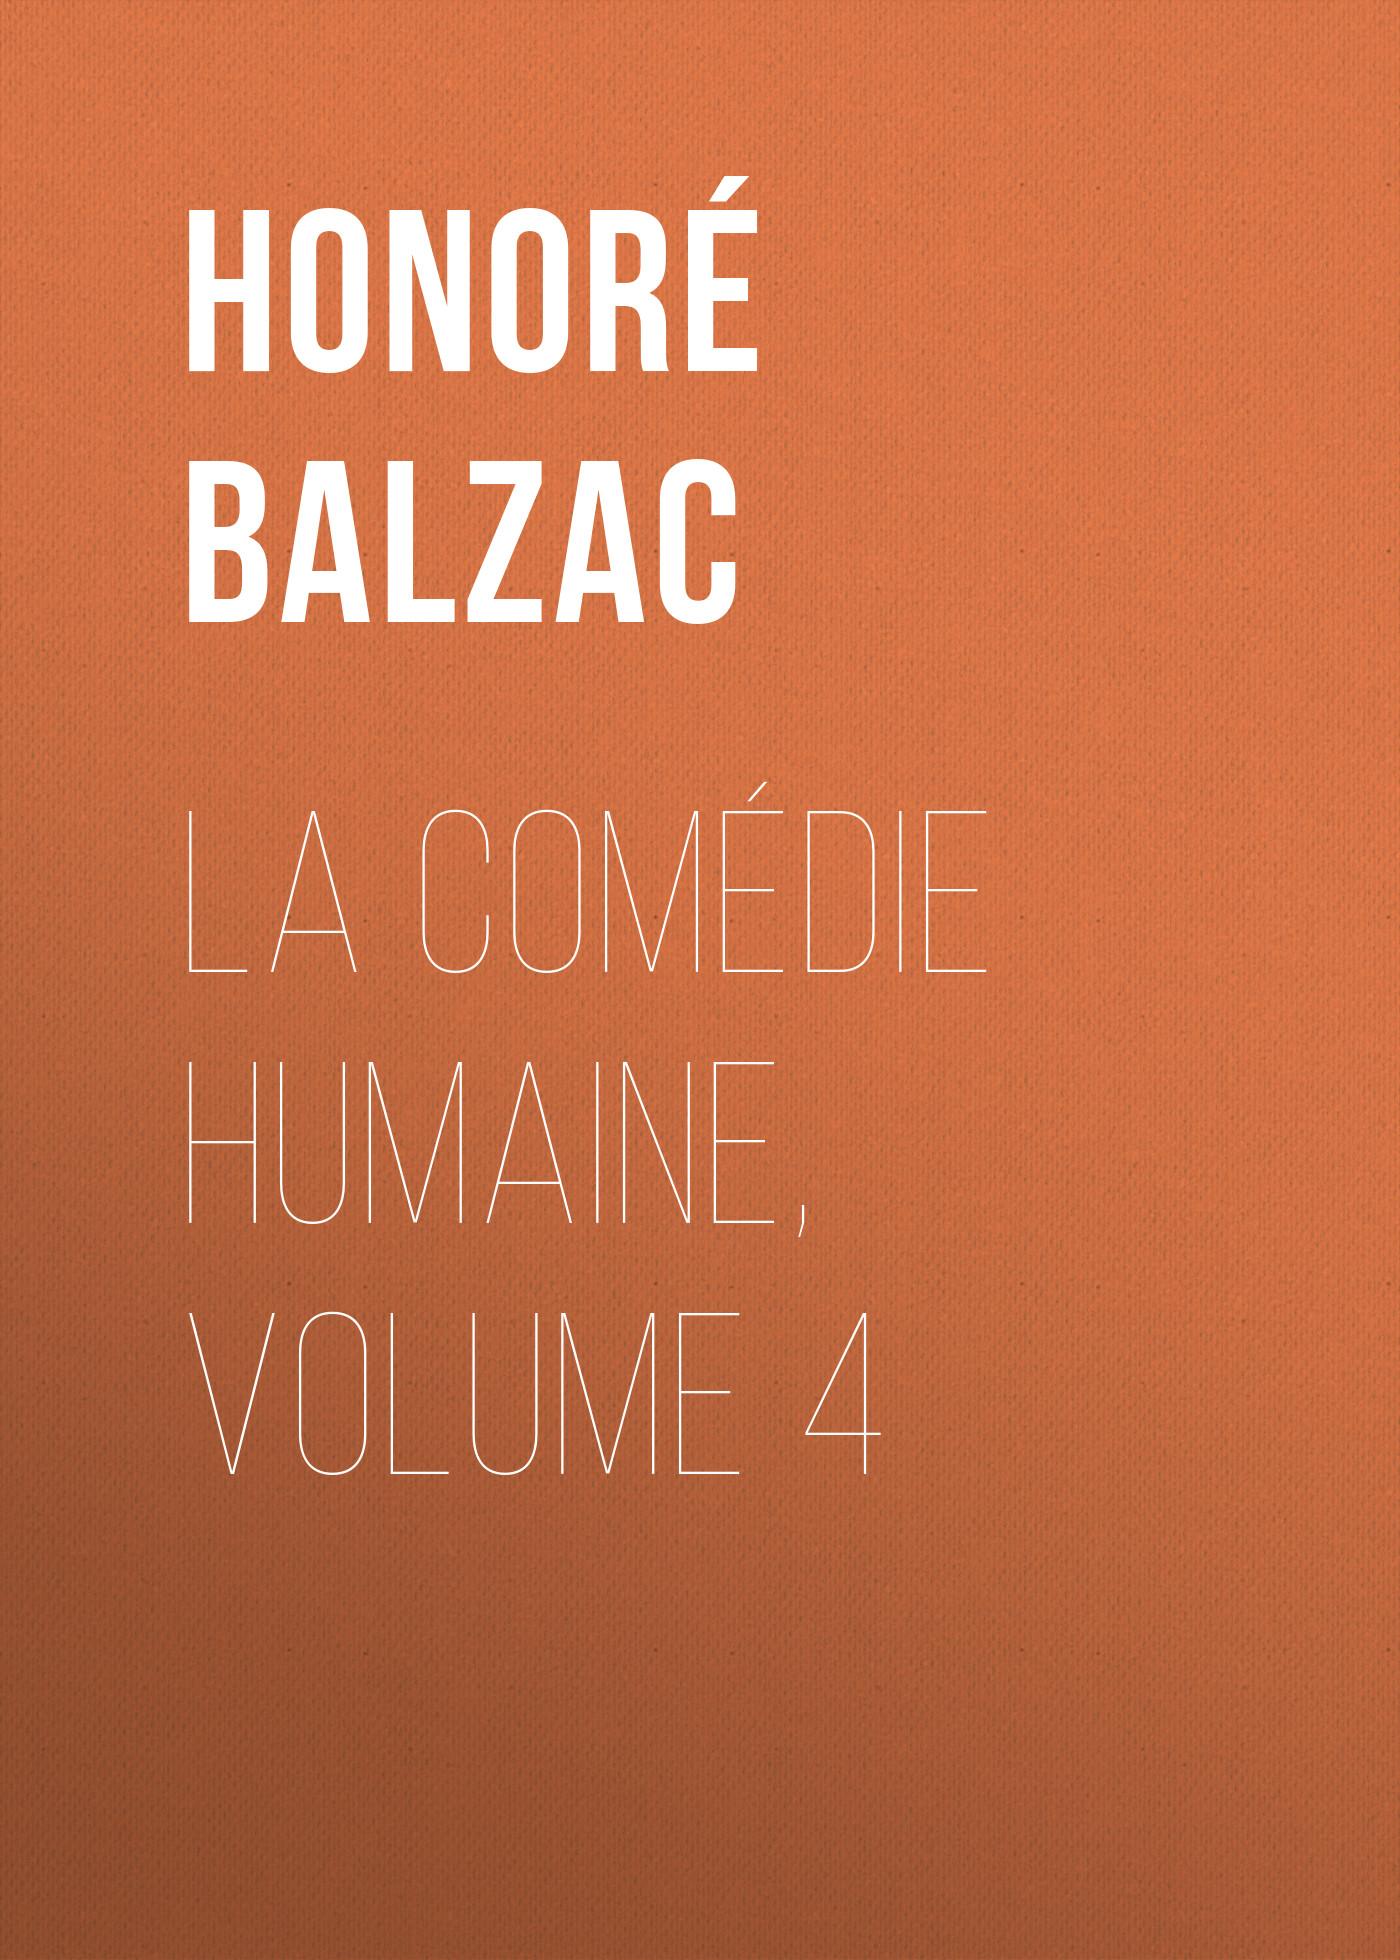 la comedie humaine volume 4